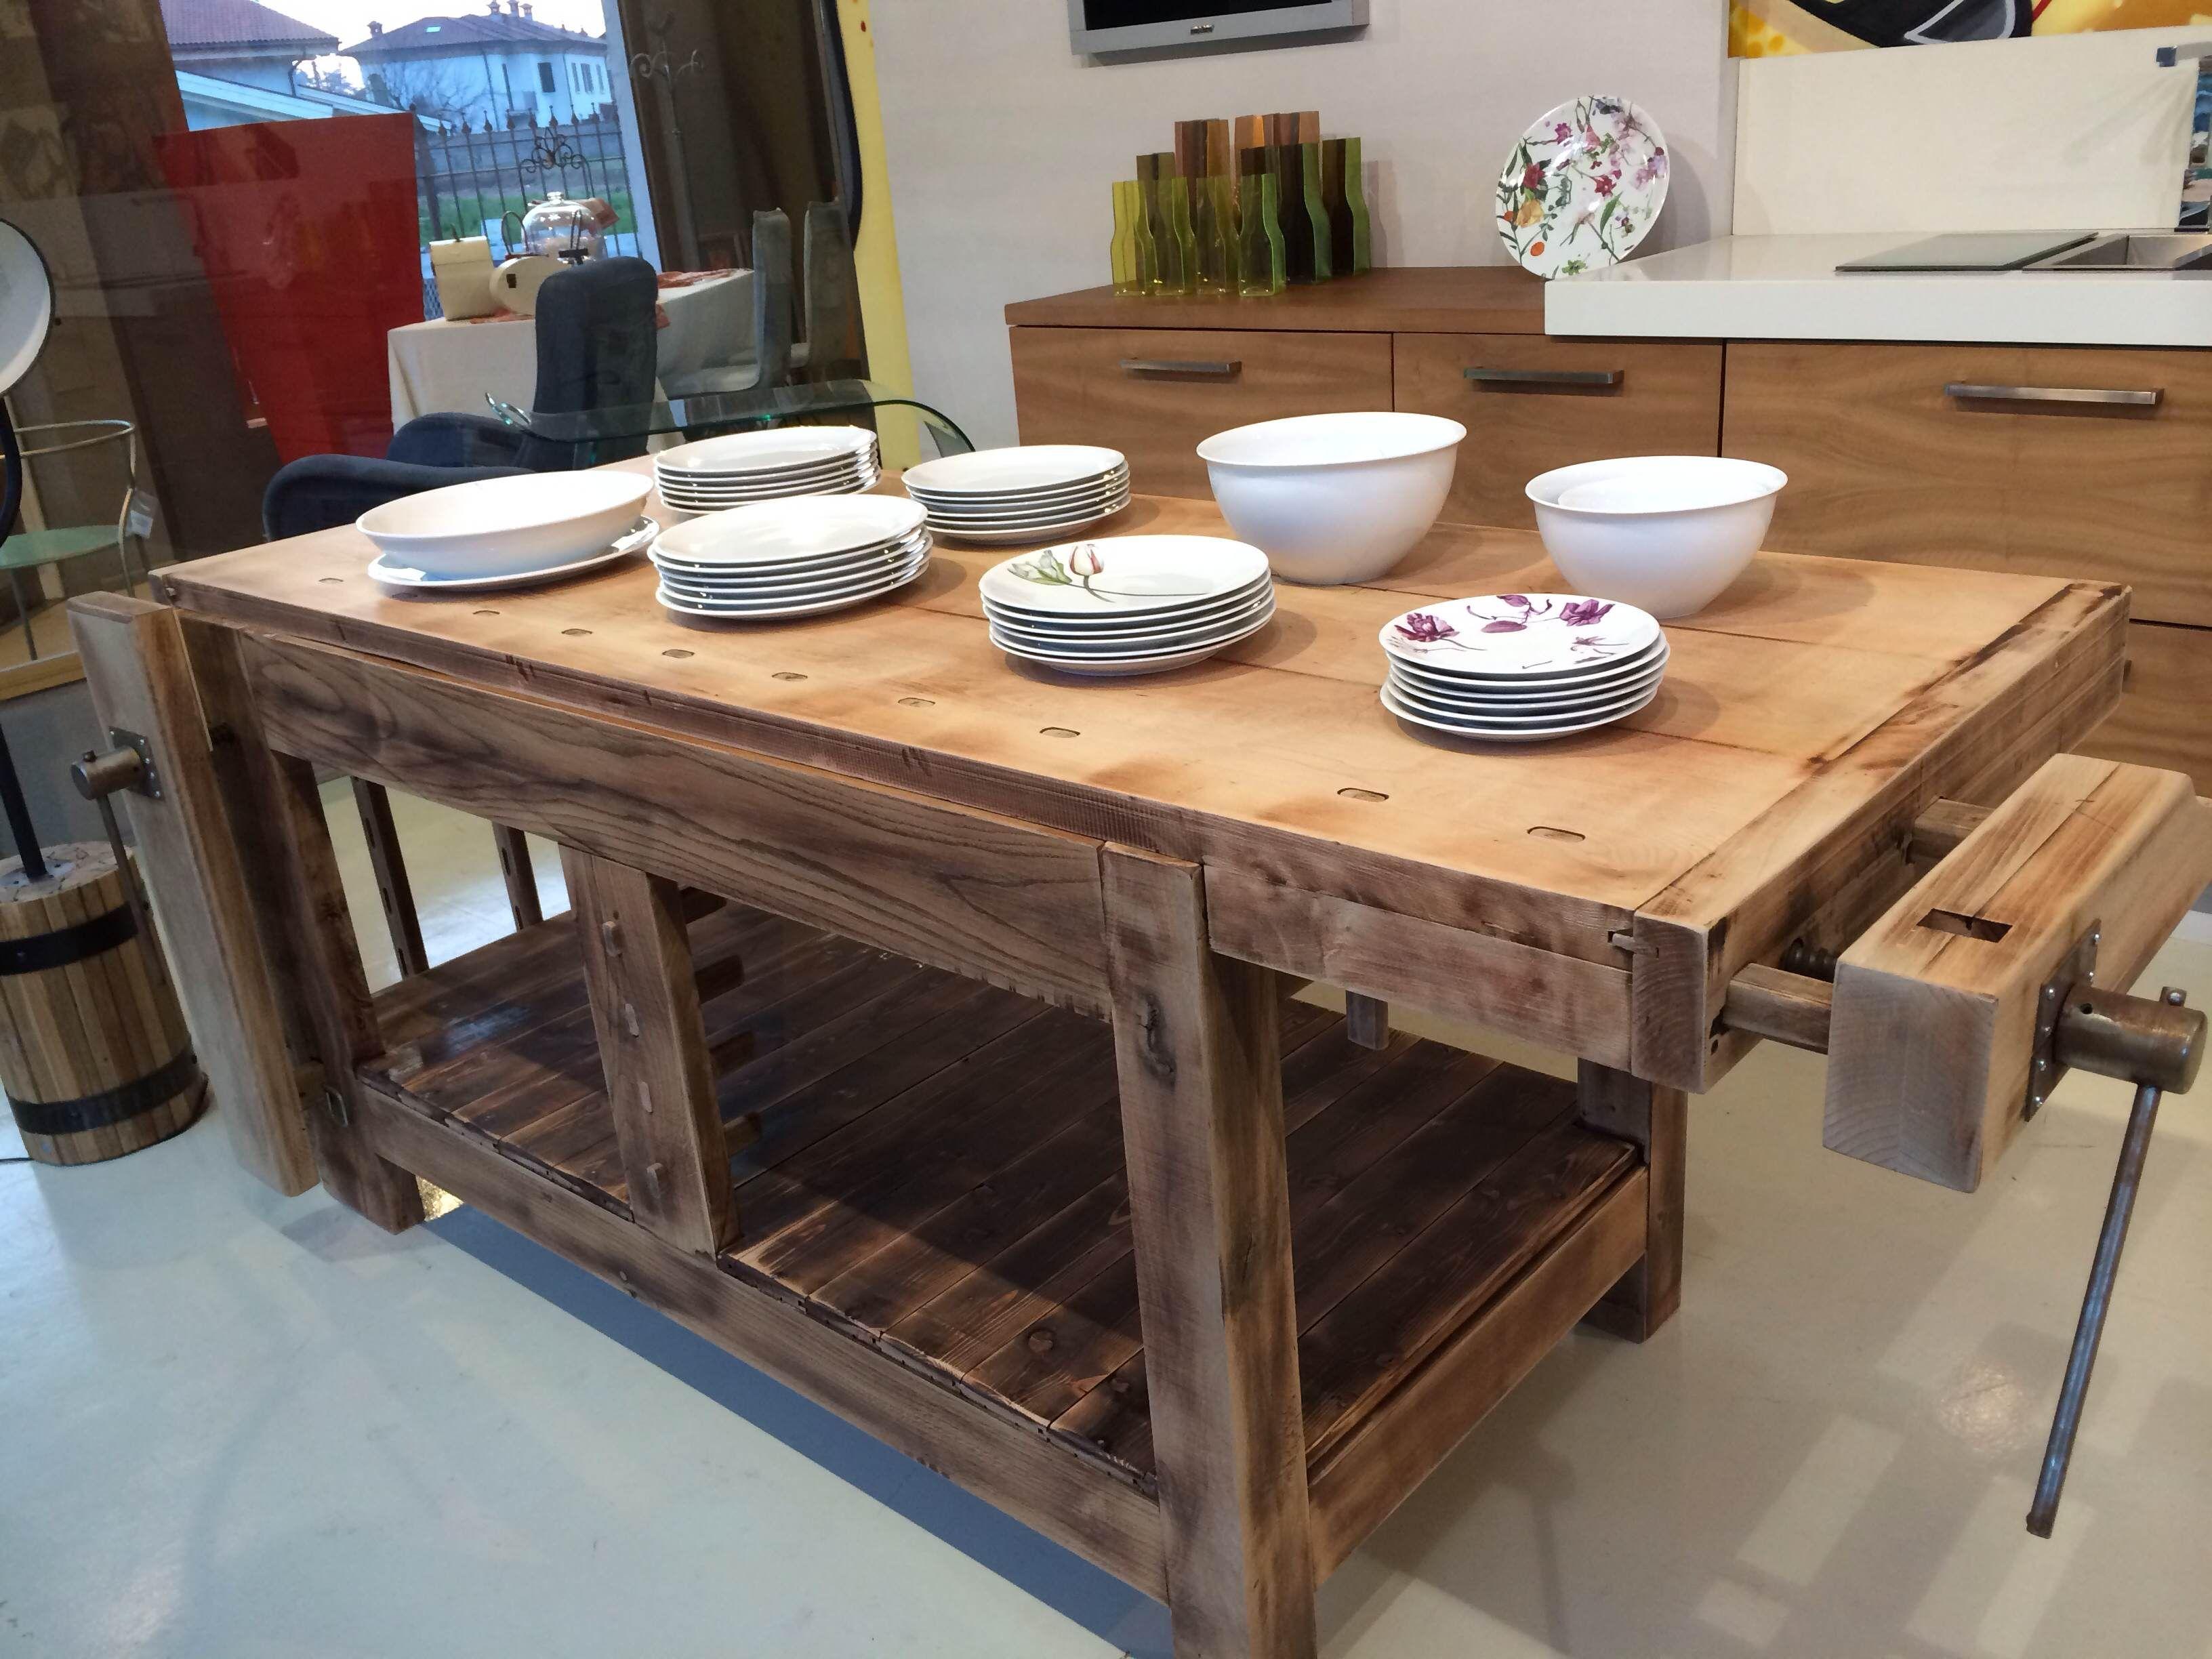 Banco Da Falegname Antico cucina tavolo falegname-1 (con immagini) | tavolo falegname